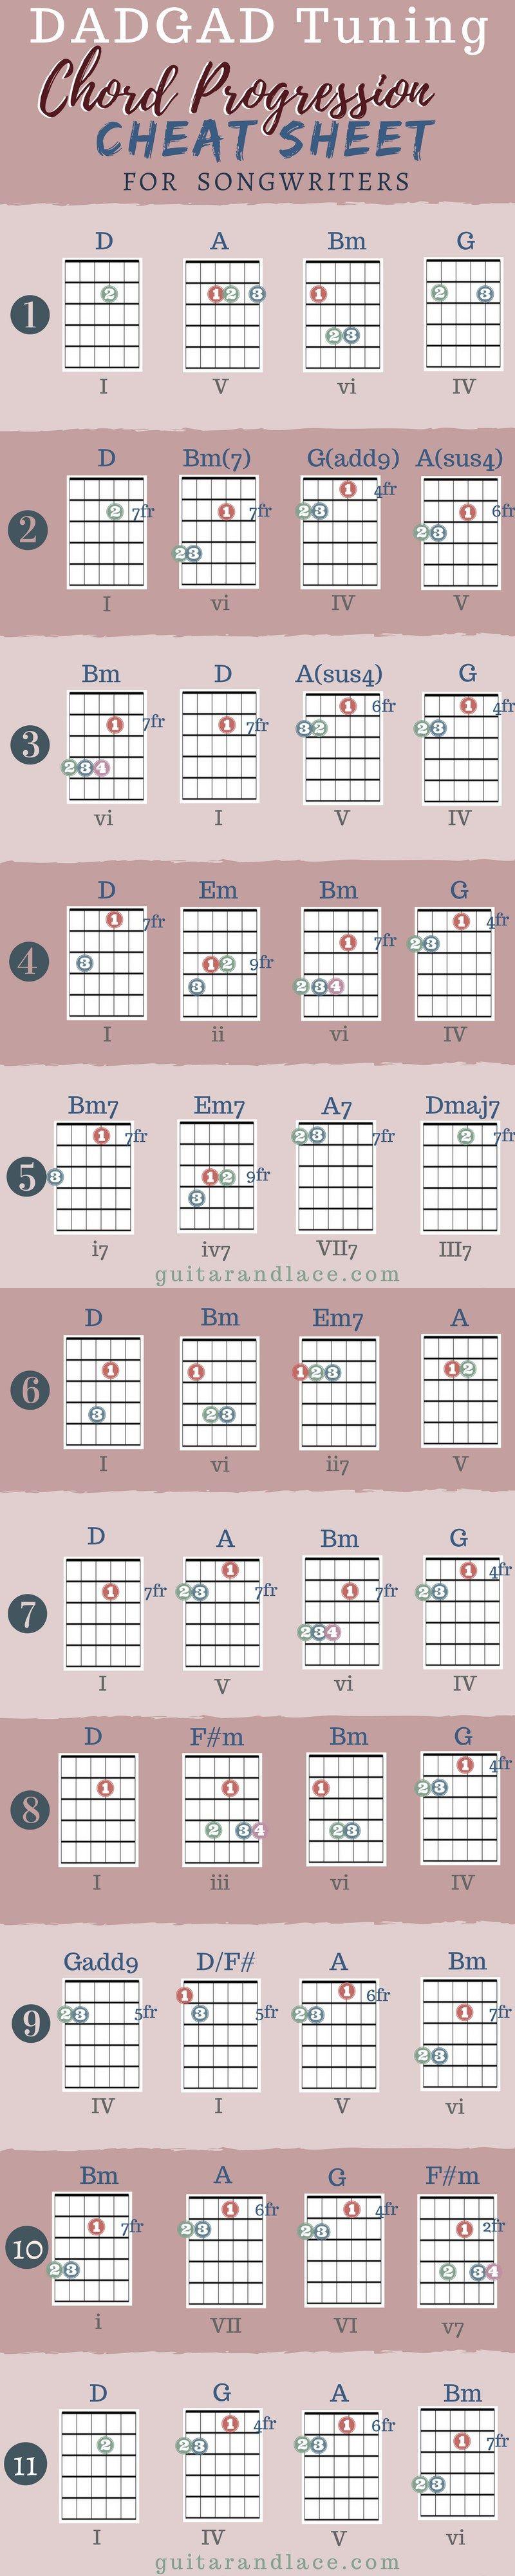 7 Ways To Make Your Guitar Songs Unique Pinterest Guitars